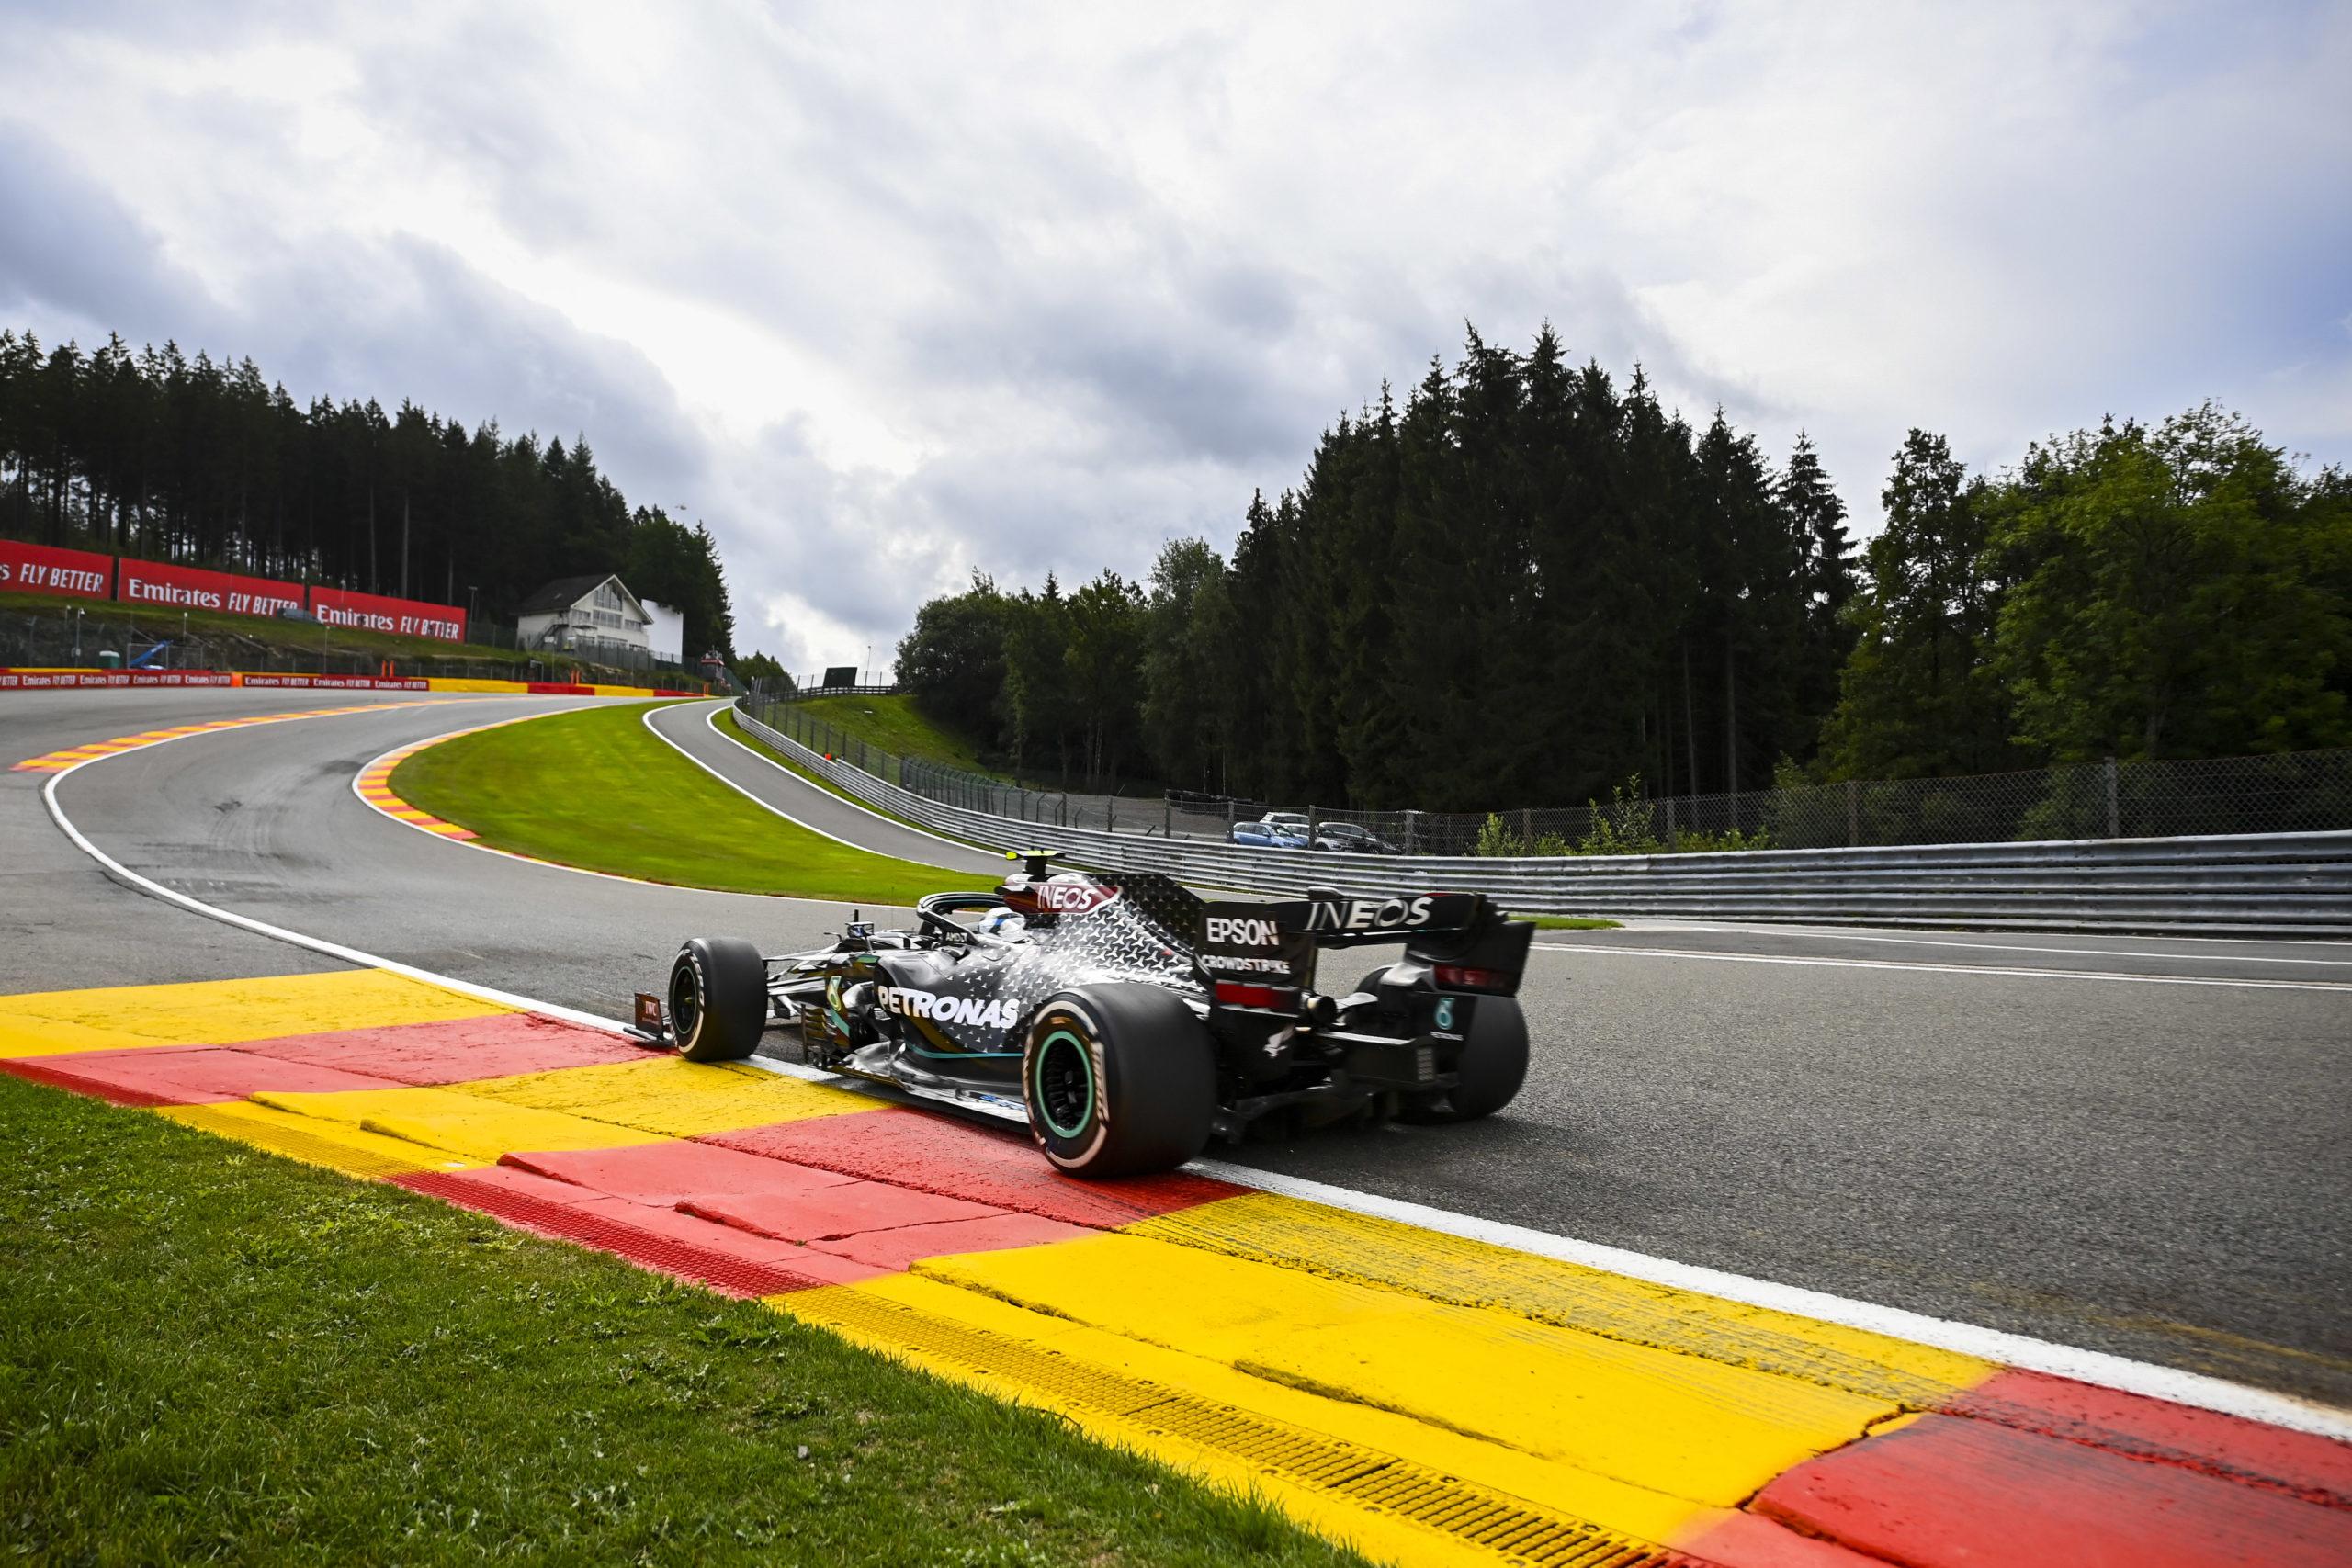 2020 Belgian Grand Prix, Friday - LAT Images, Mercedes, Bottas